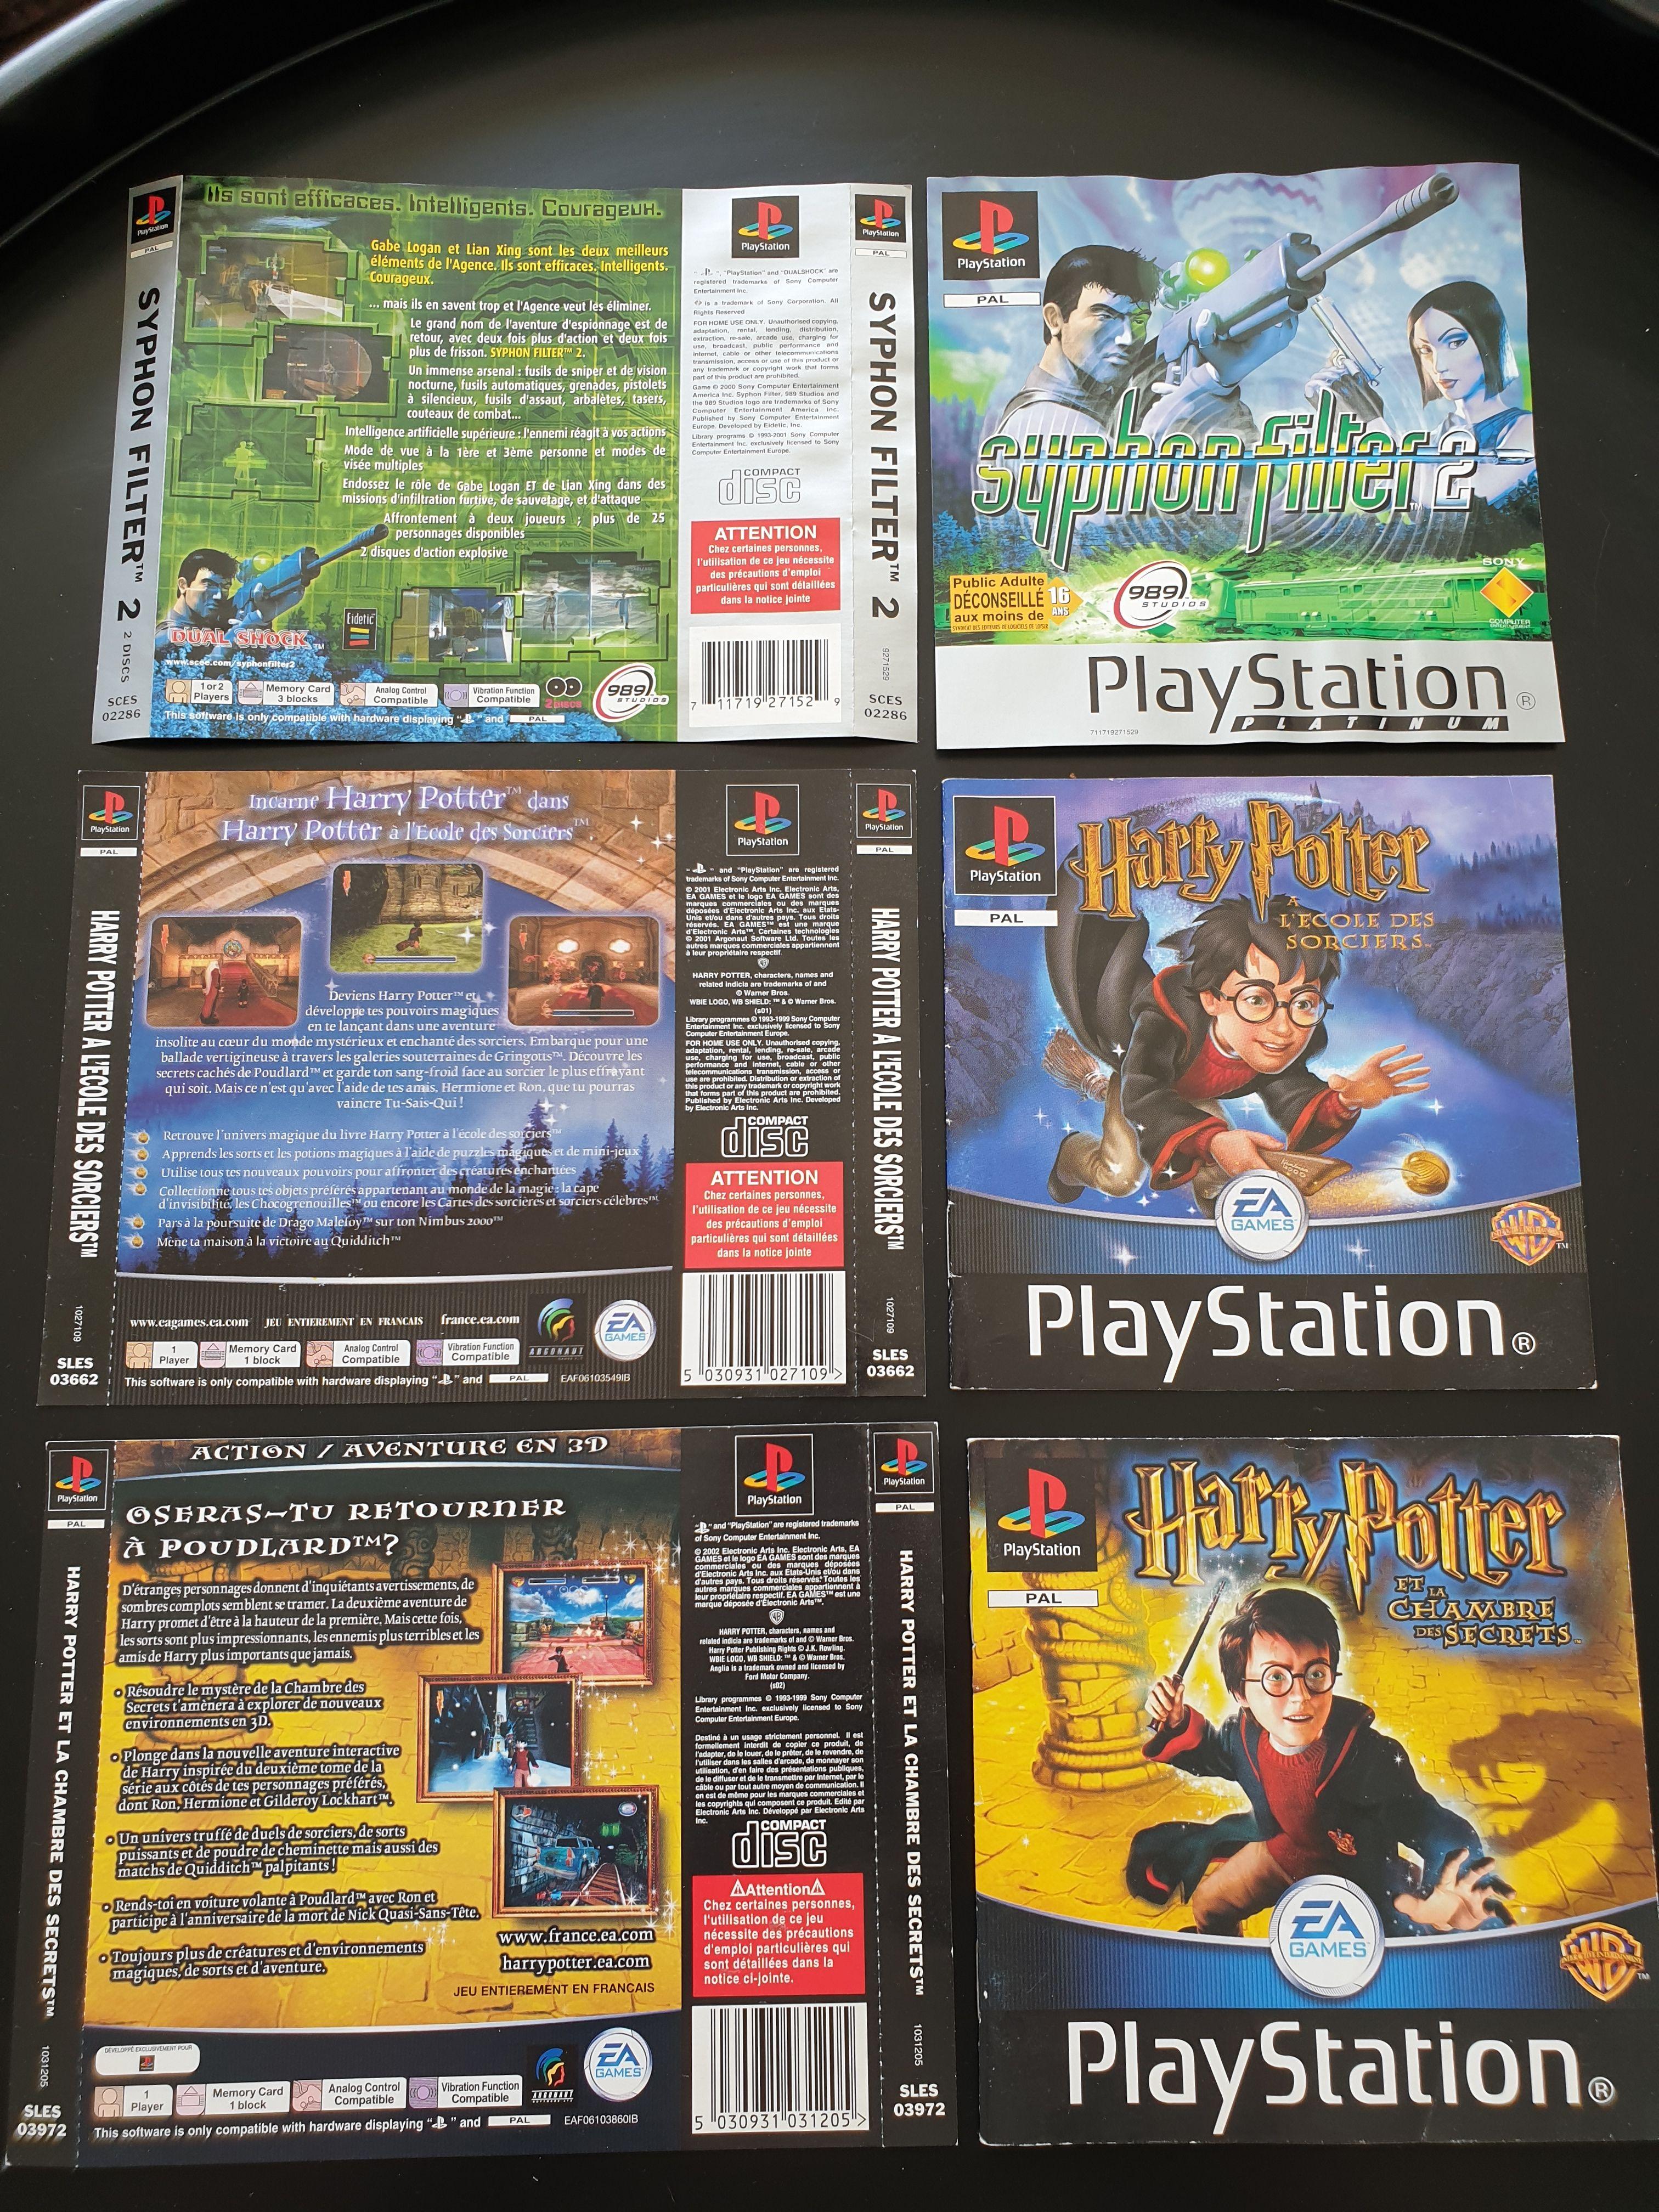 [ECH/RECH] Orphelins Sega / Sony / Nintendo et autre (photos) Zl5aJ7